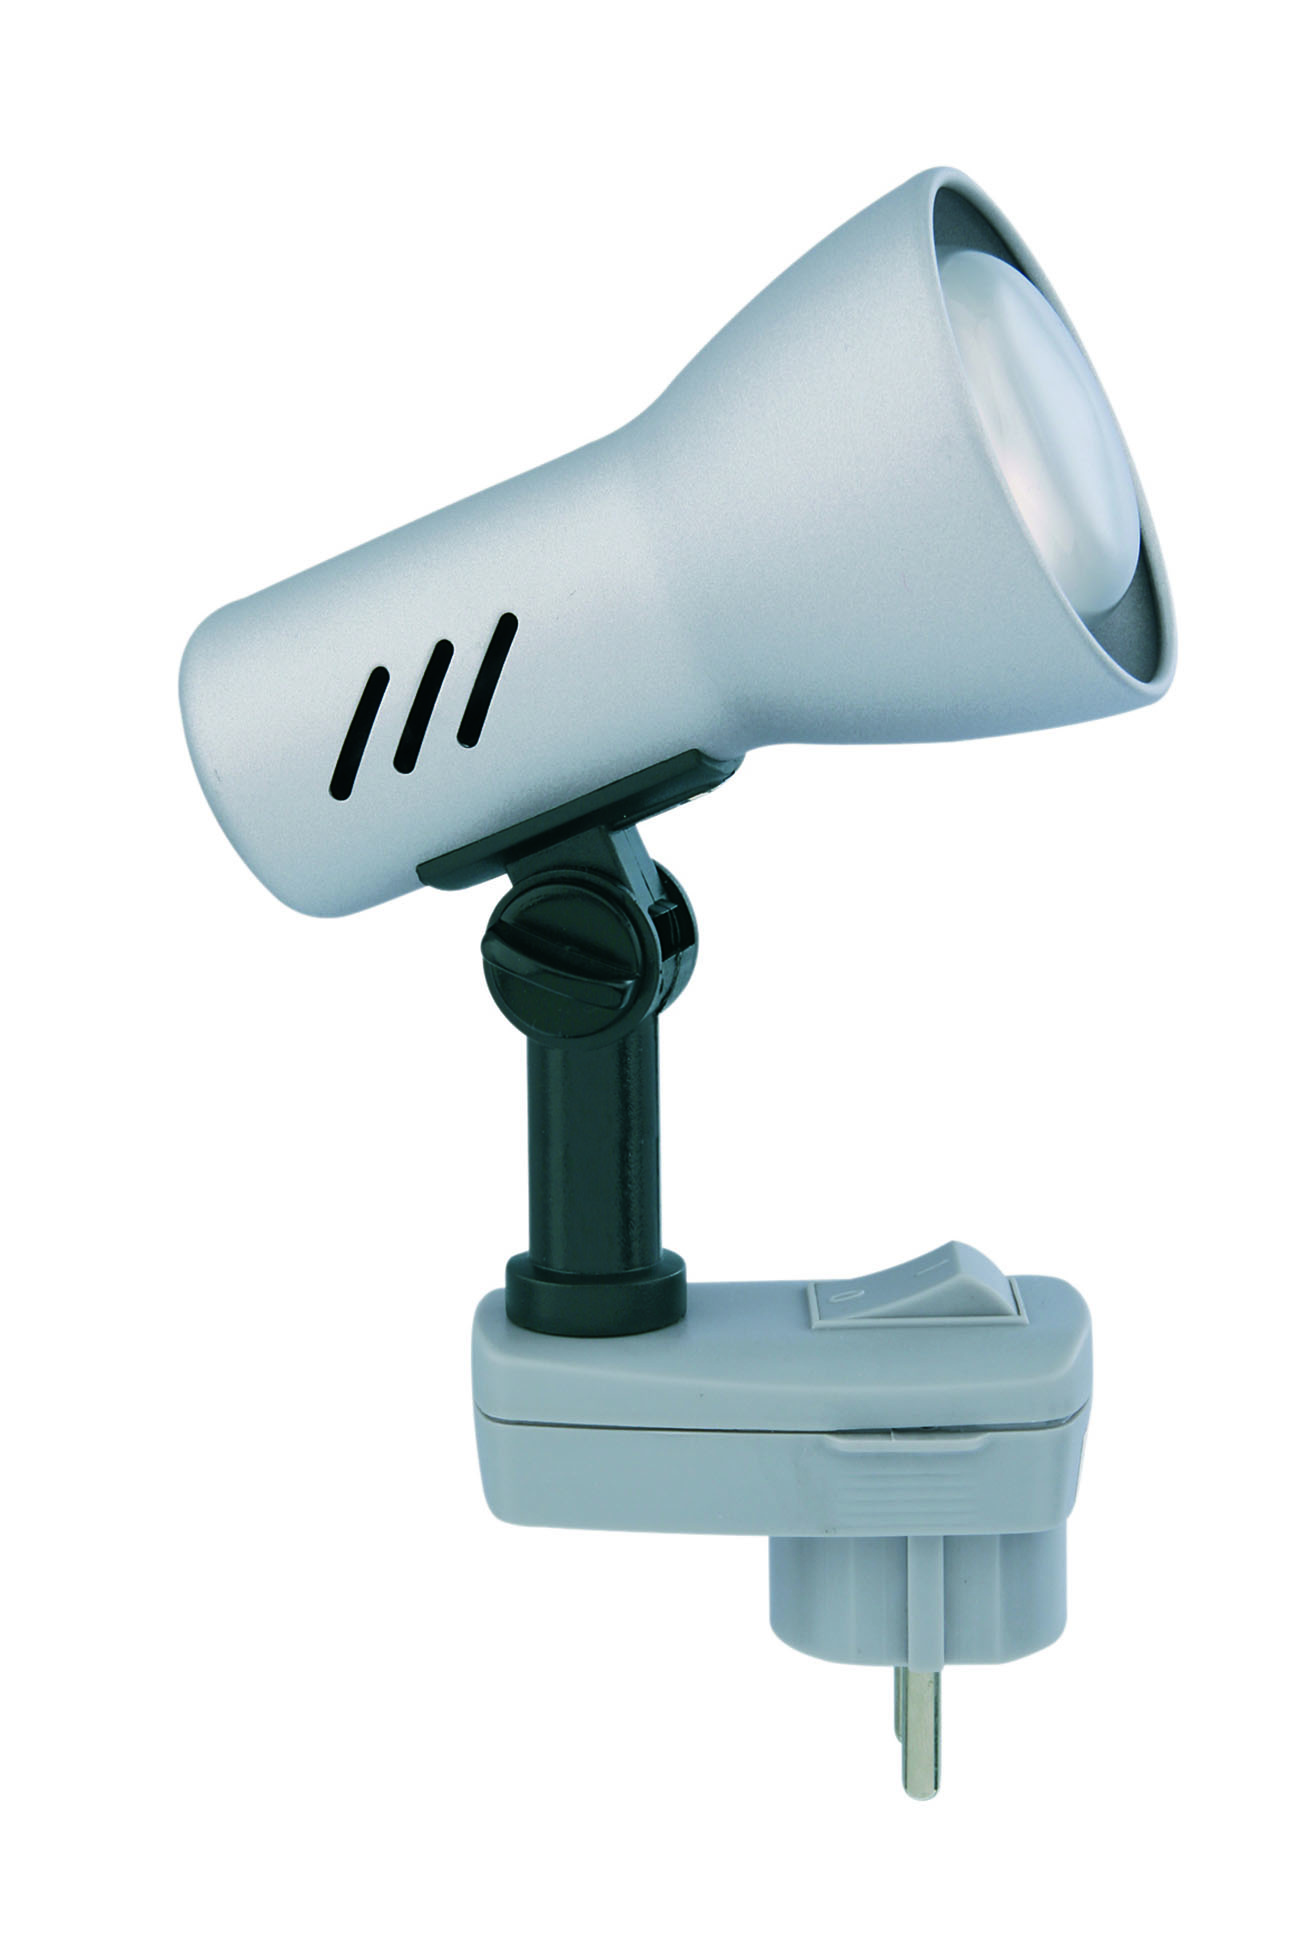 LED Steckerleuchte, 10 cm, max. 25 W, Titan